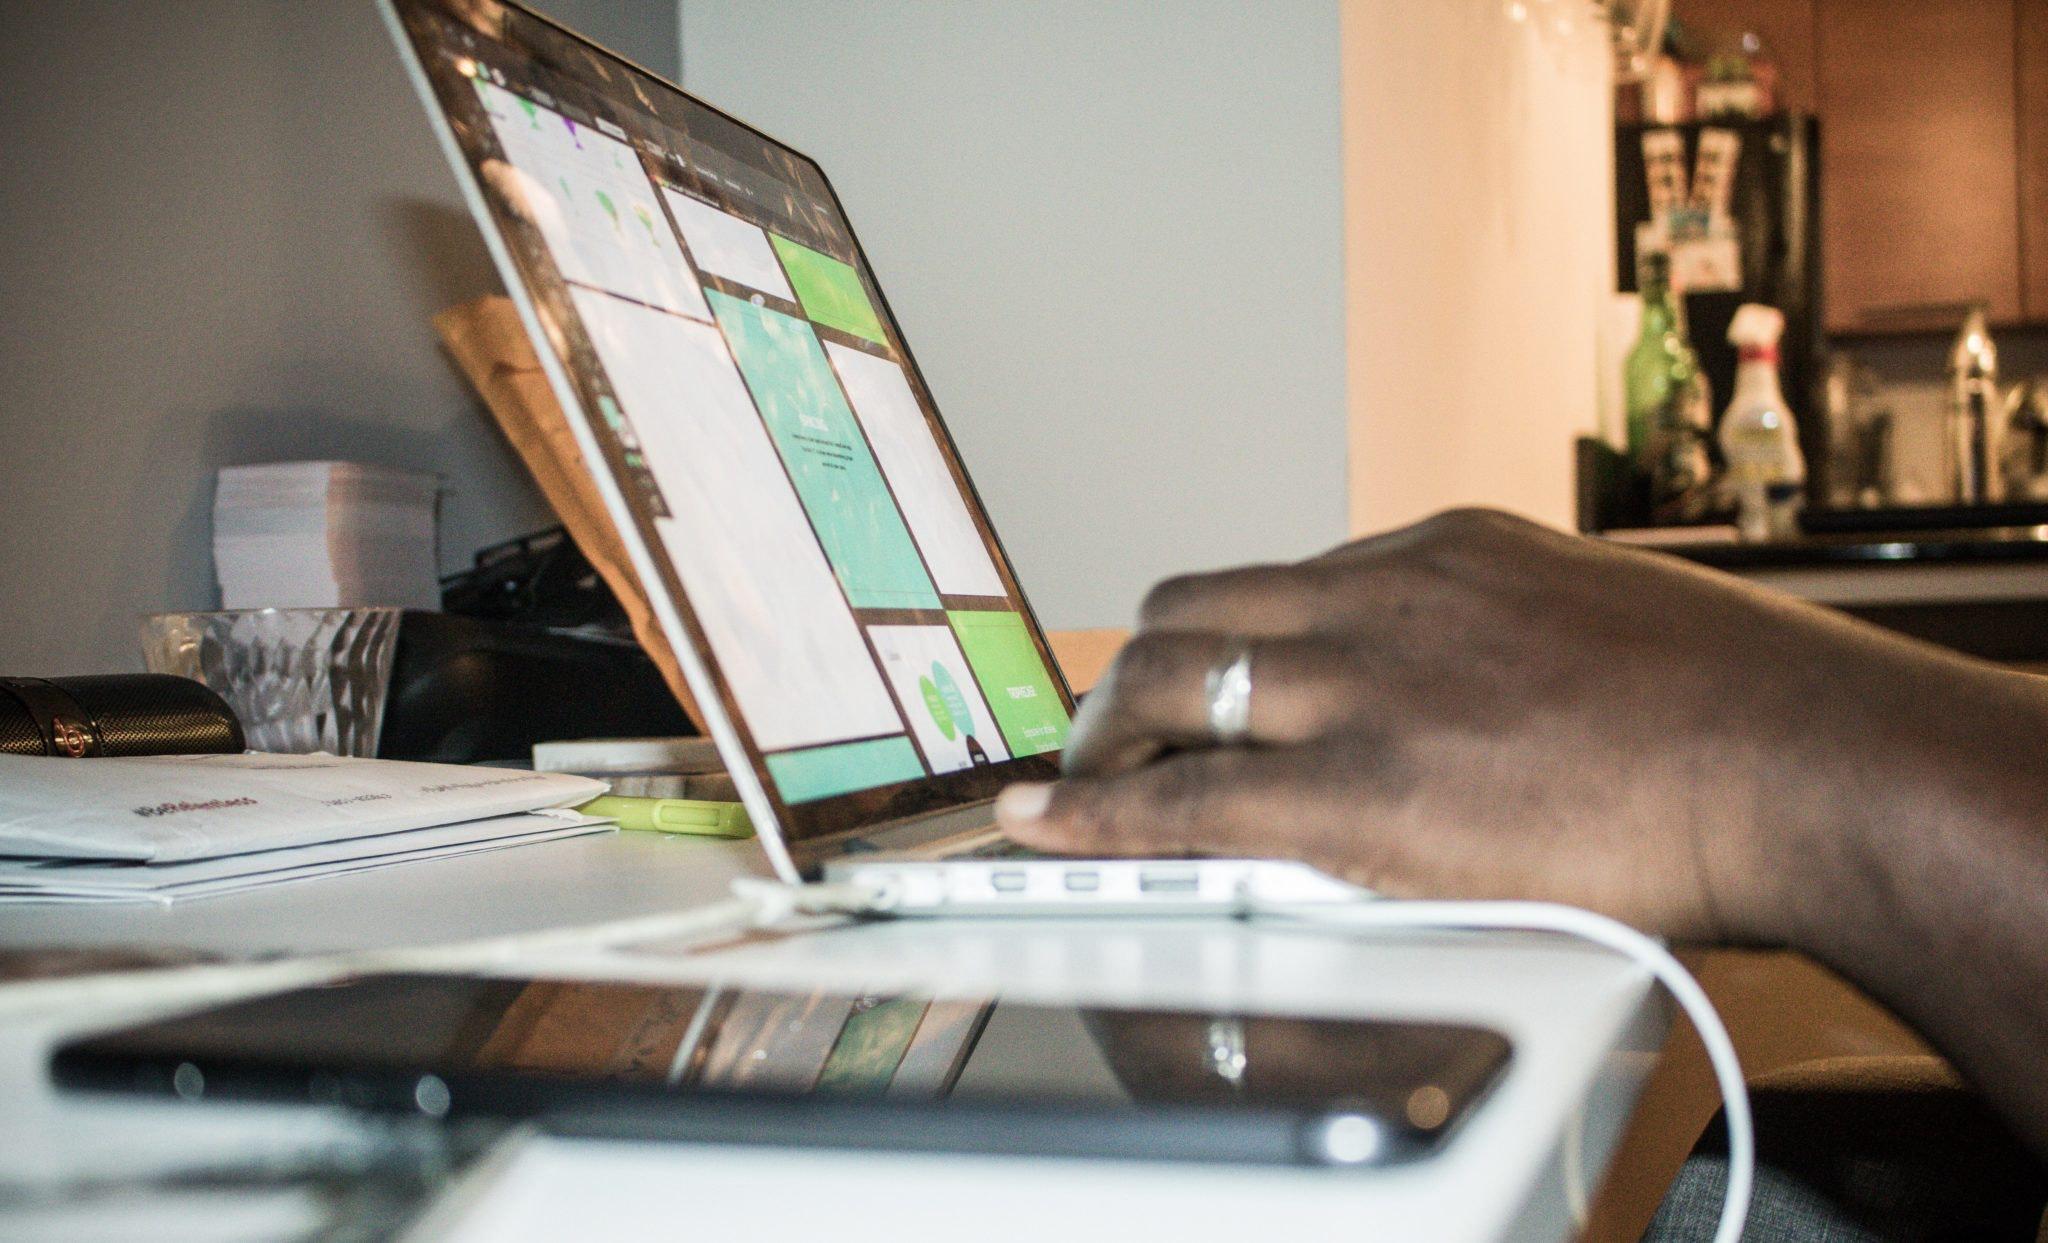 cisco-skype-laptop-phone-collaboration